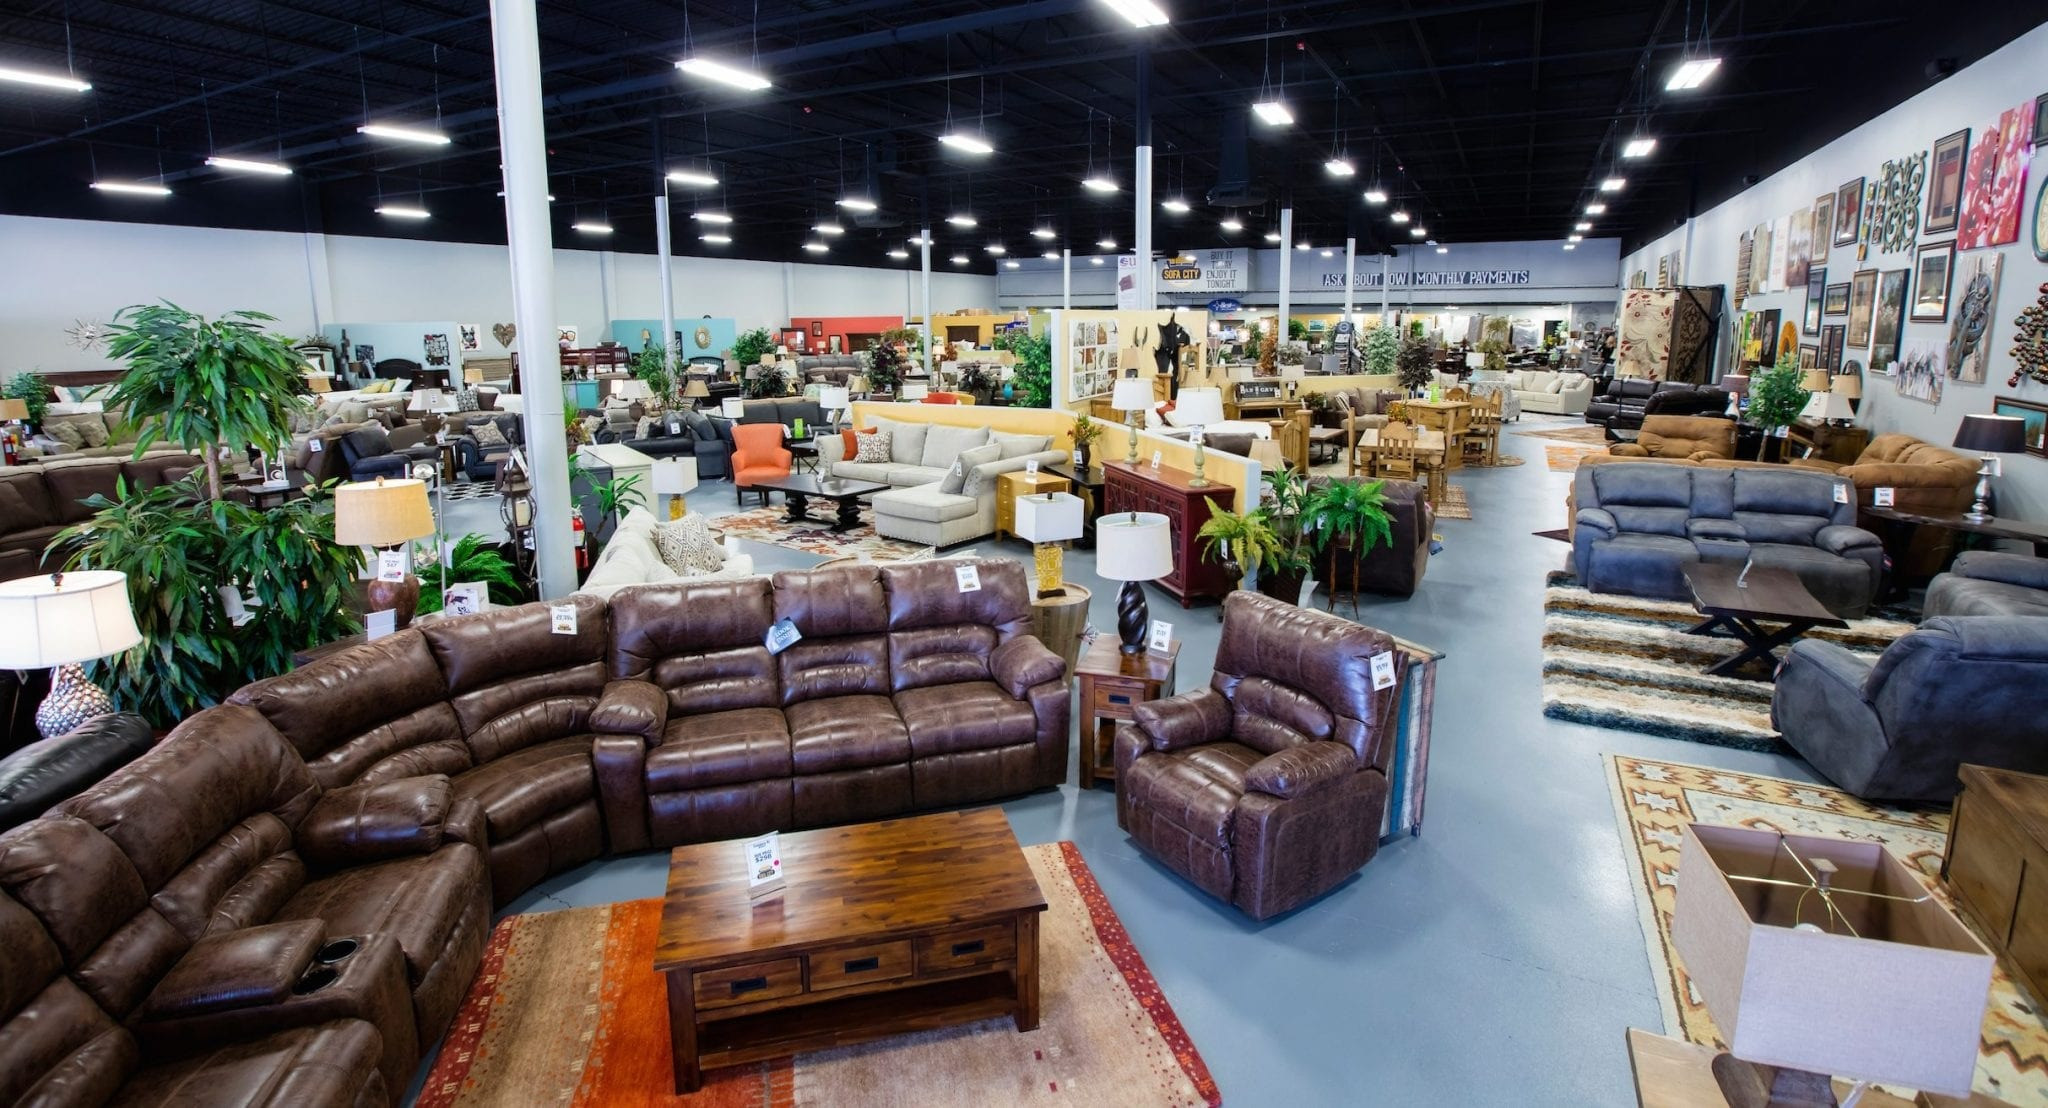 Sofa City  Furniture  Springfield MO  Fort Smith AR  Harrison AR